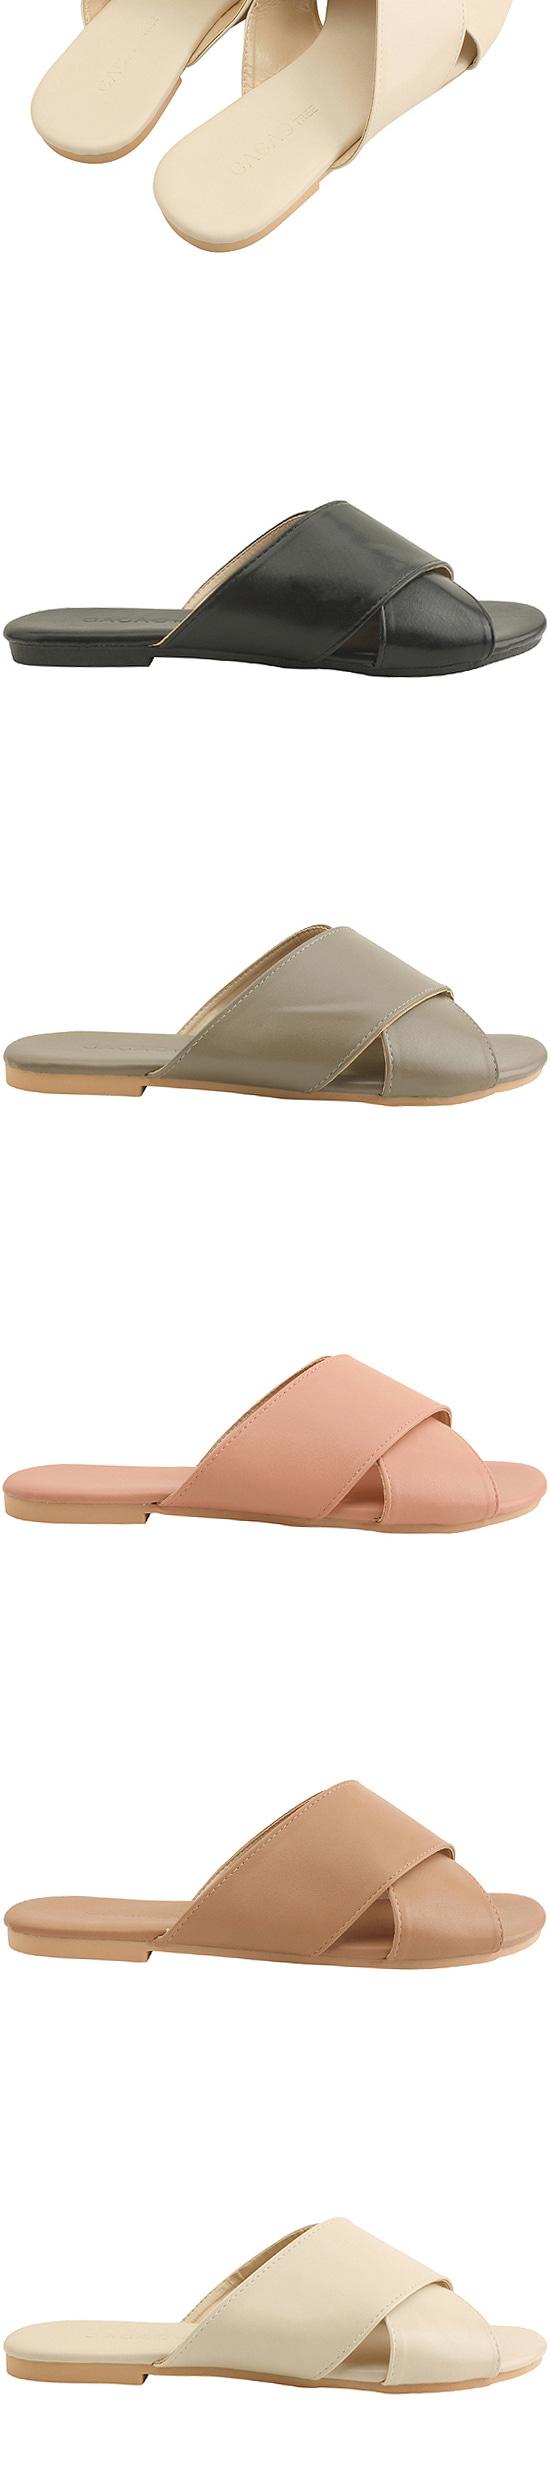 Cross Strap Simple Slippers Brown